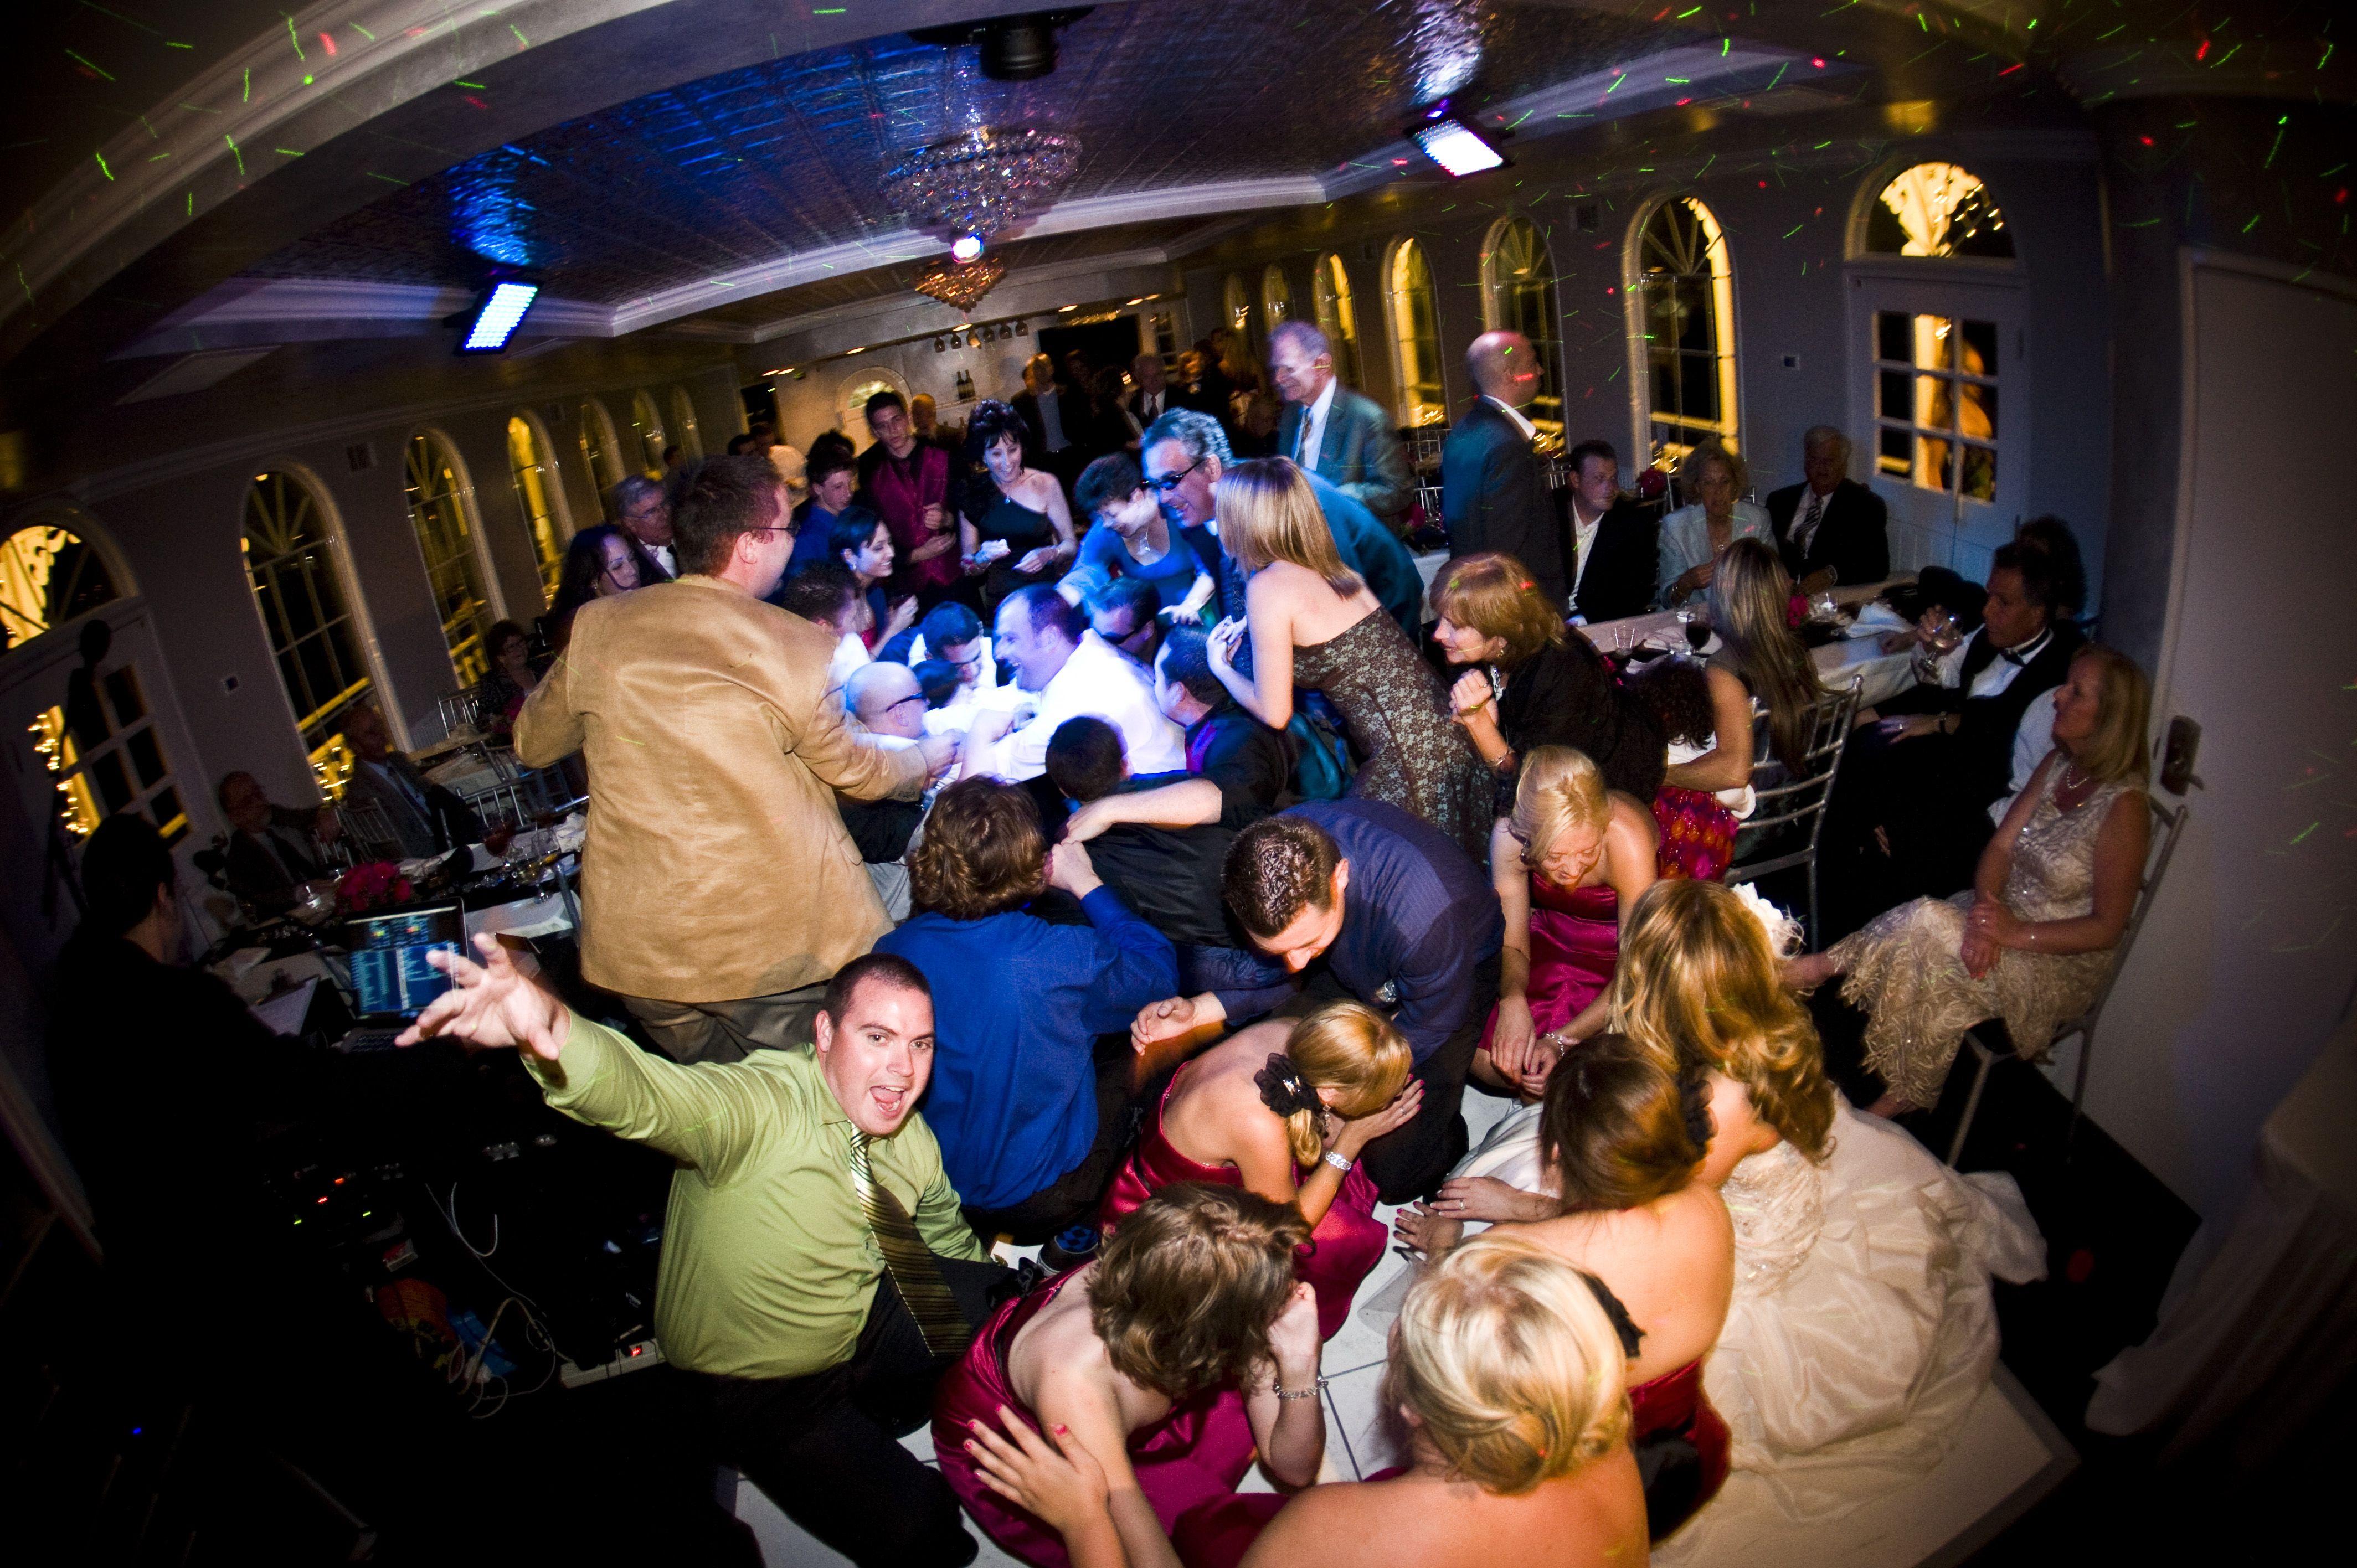 Let's Party!  #ScarlettBelleCruises  #Weddings #BirthdayParties #CorporateParties #Fun #Boat #Harbor #CaliforniaExperience #Riverboat #Cruises